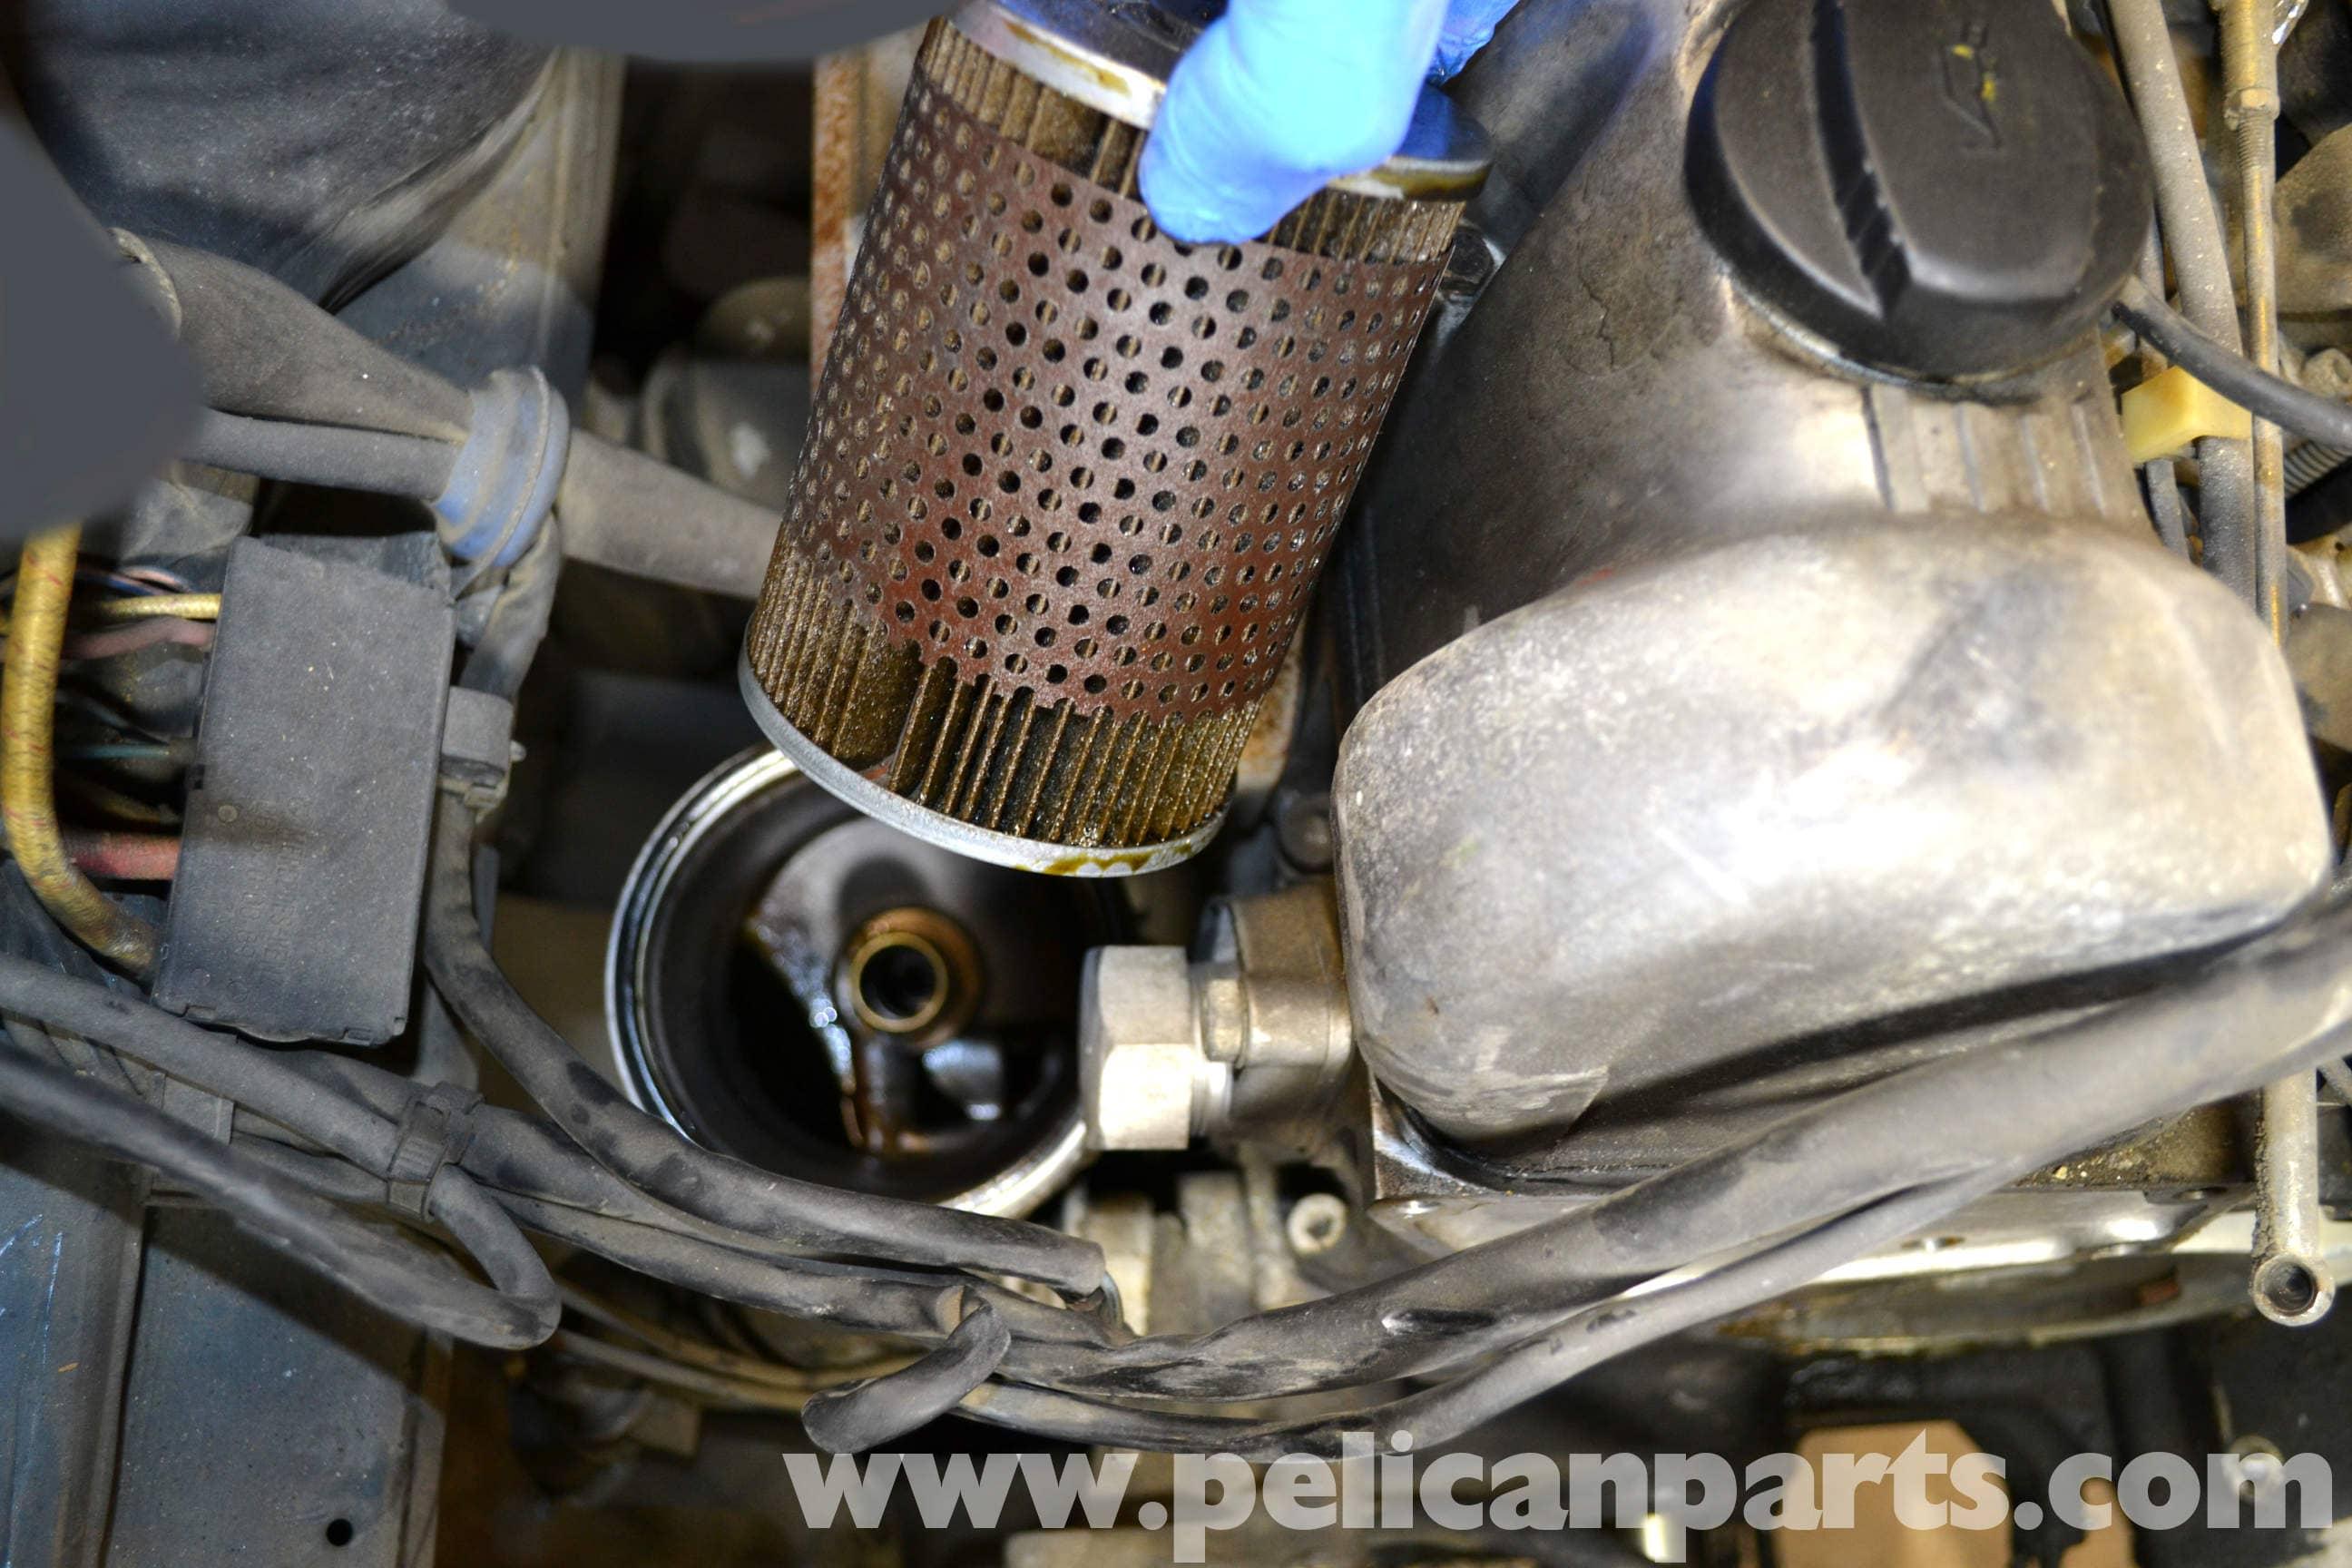 Mercedes-Benz W126 Oil Change | 1981-1991 S-Class | Pelican Parts ...